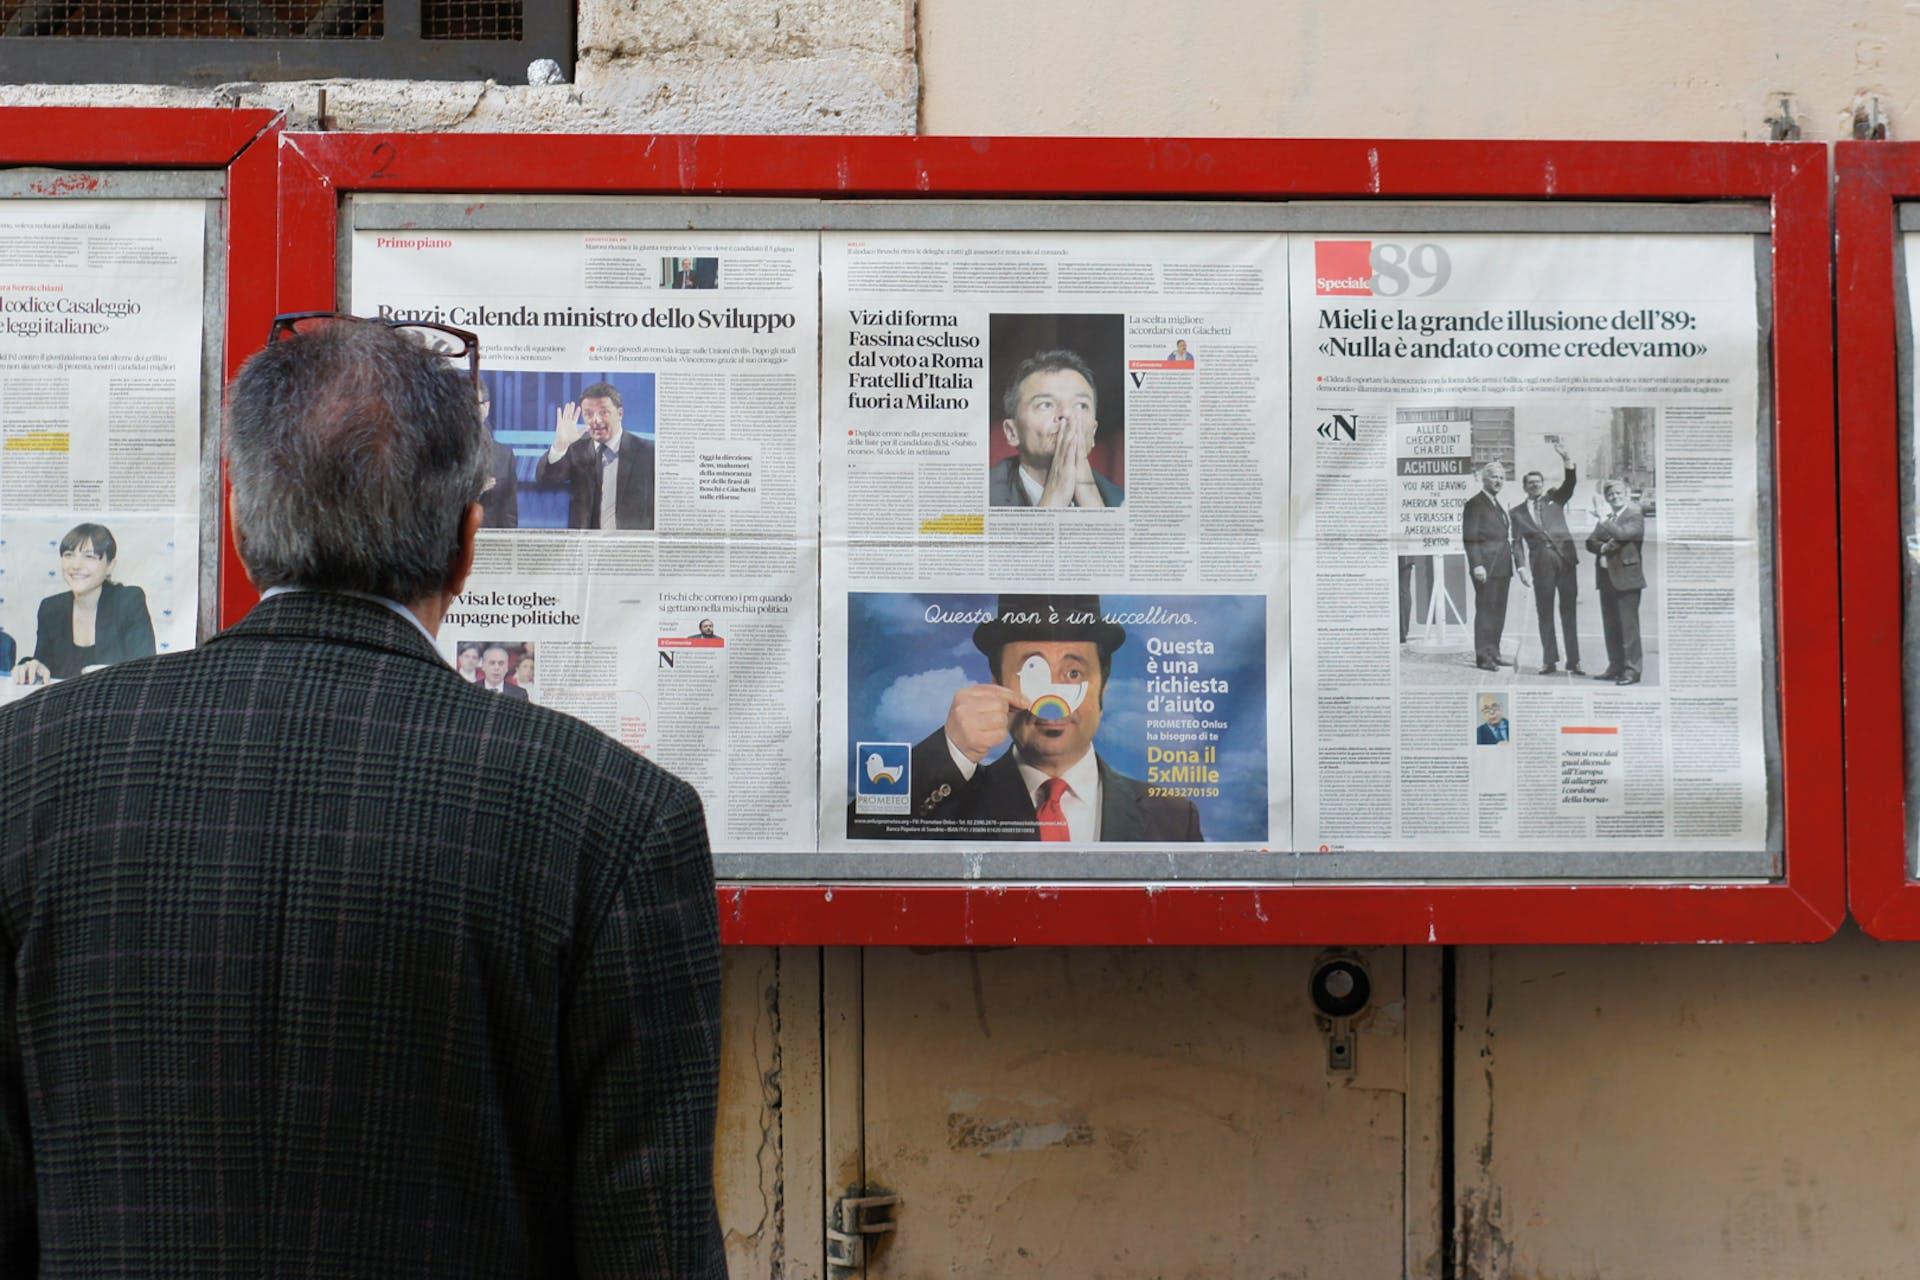 man reading the newspaper